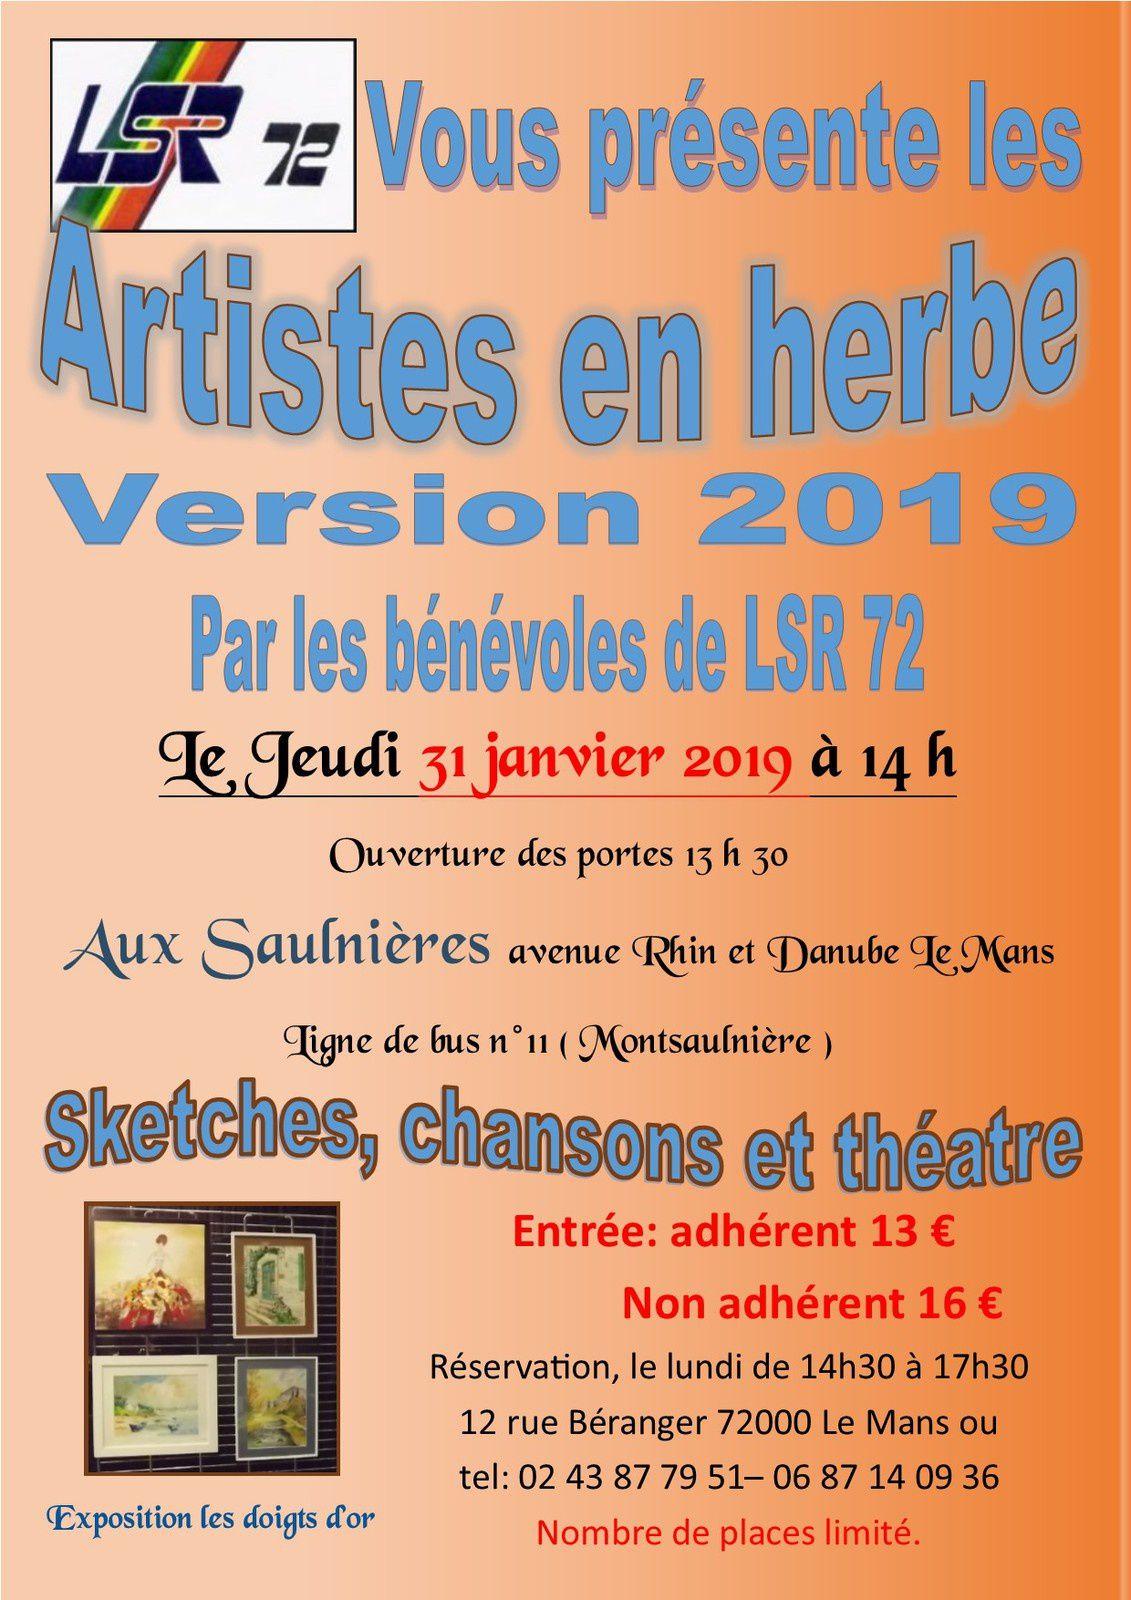 LES ARTISTES EN HERBE